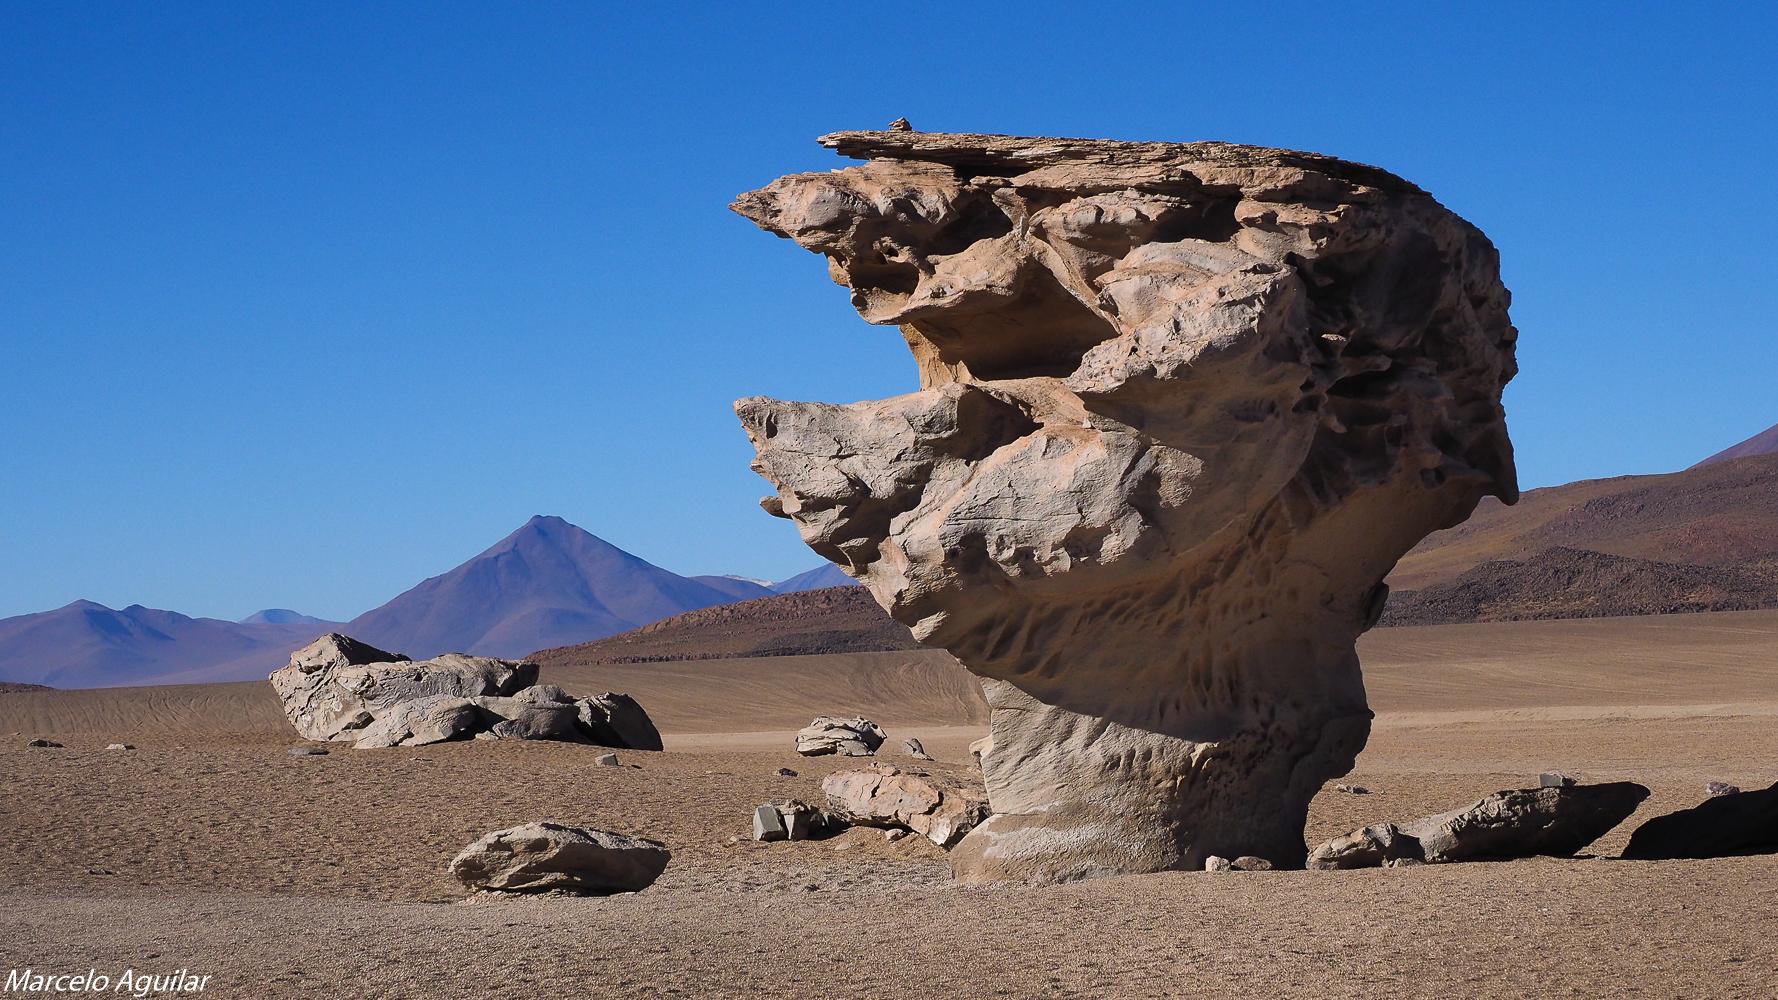 Arbol de Piedra (Rock tree), Bolivia